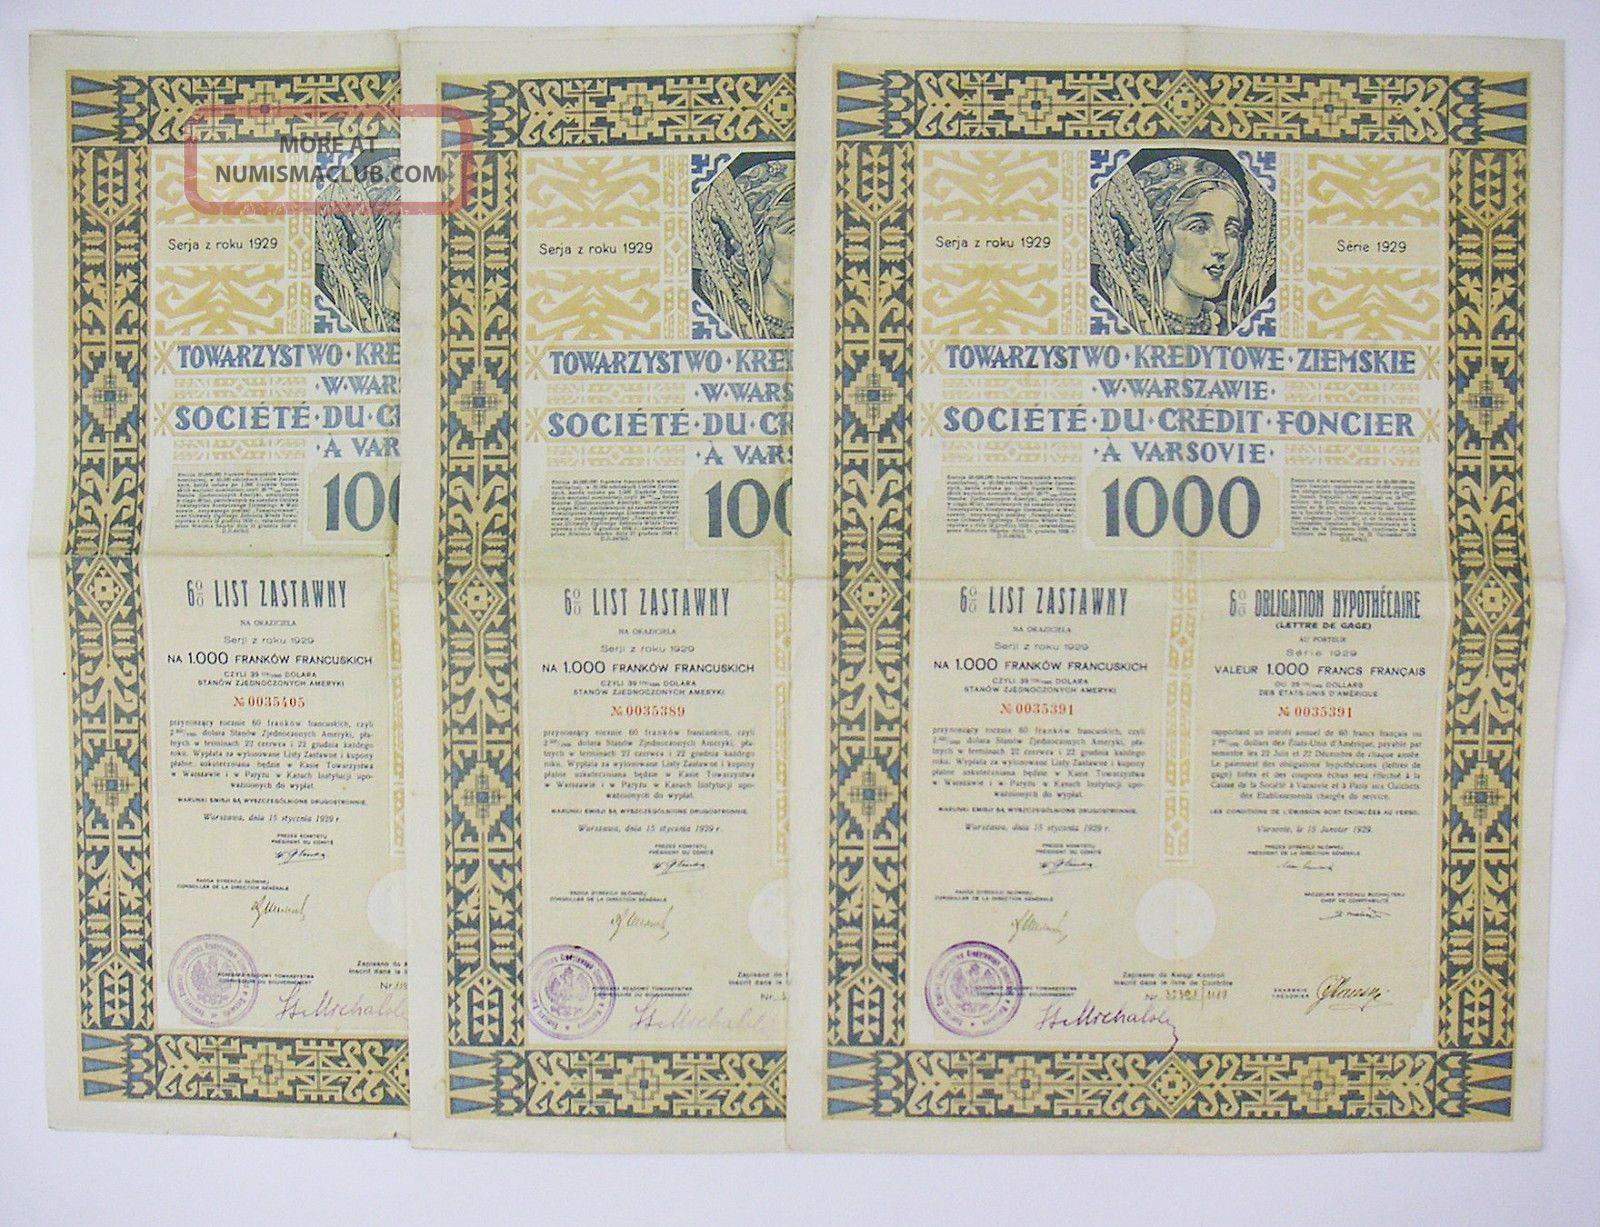 Poland 1929 - Société Du Crédit Foncier à Varsovie 1000f (x3) Stocks & Bonds, Scripophily photo